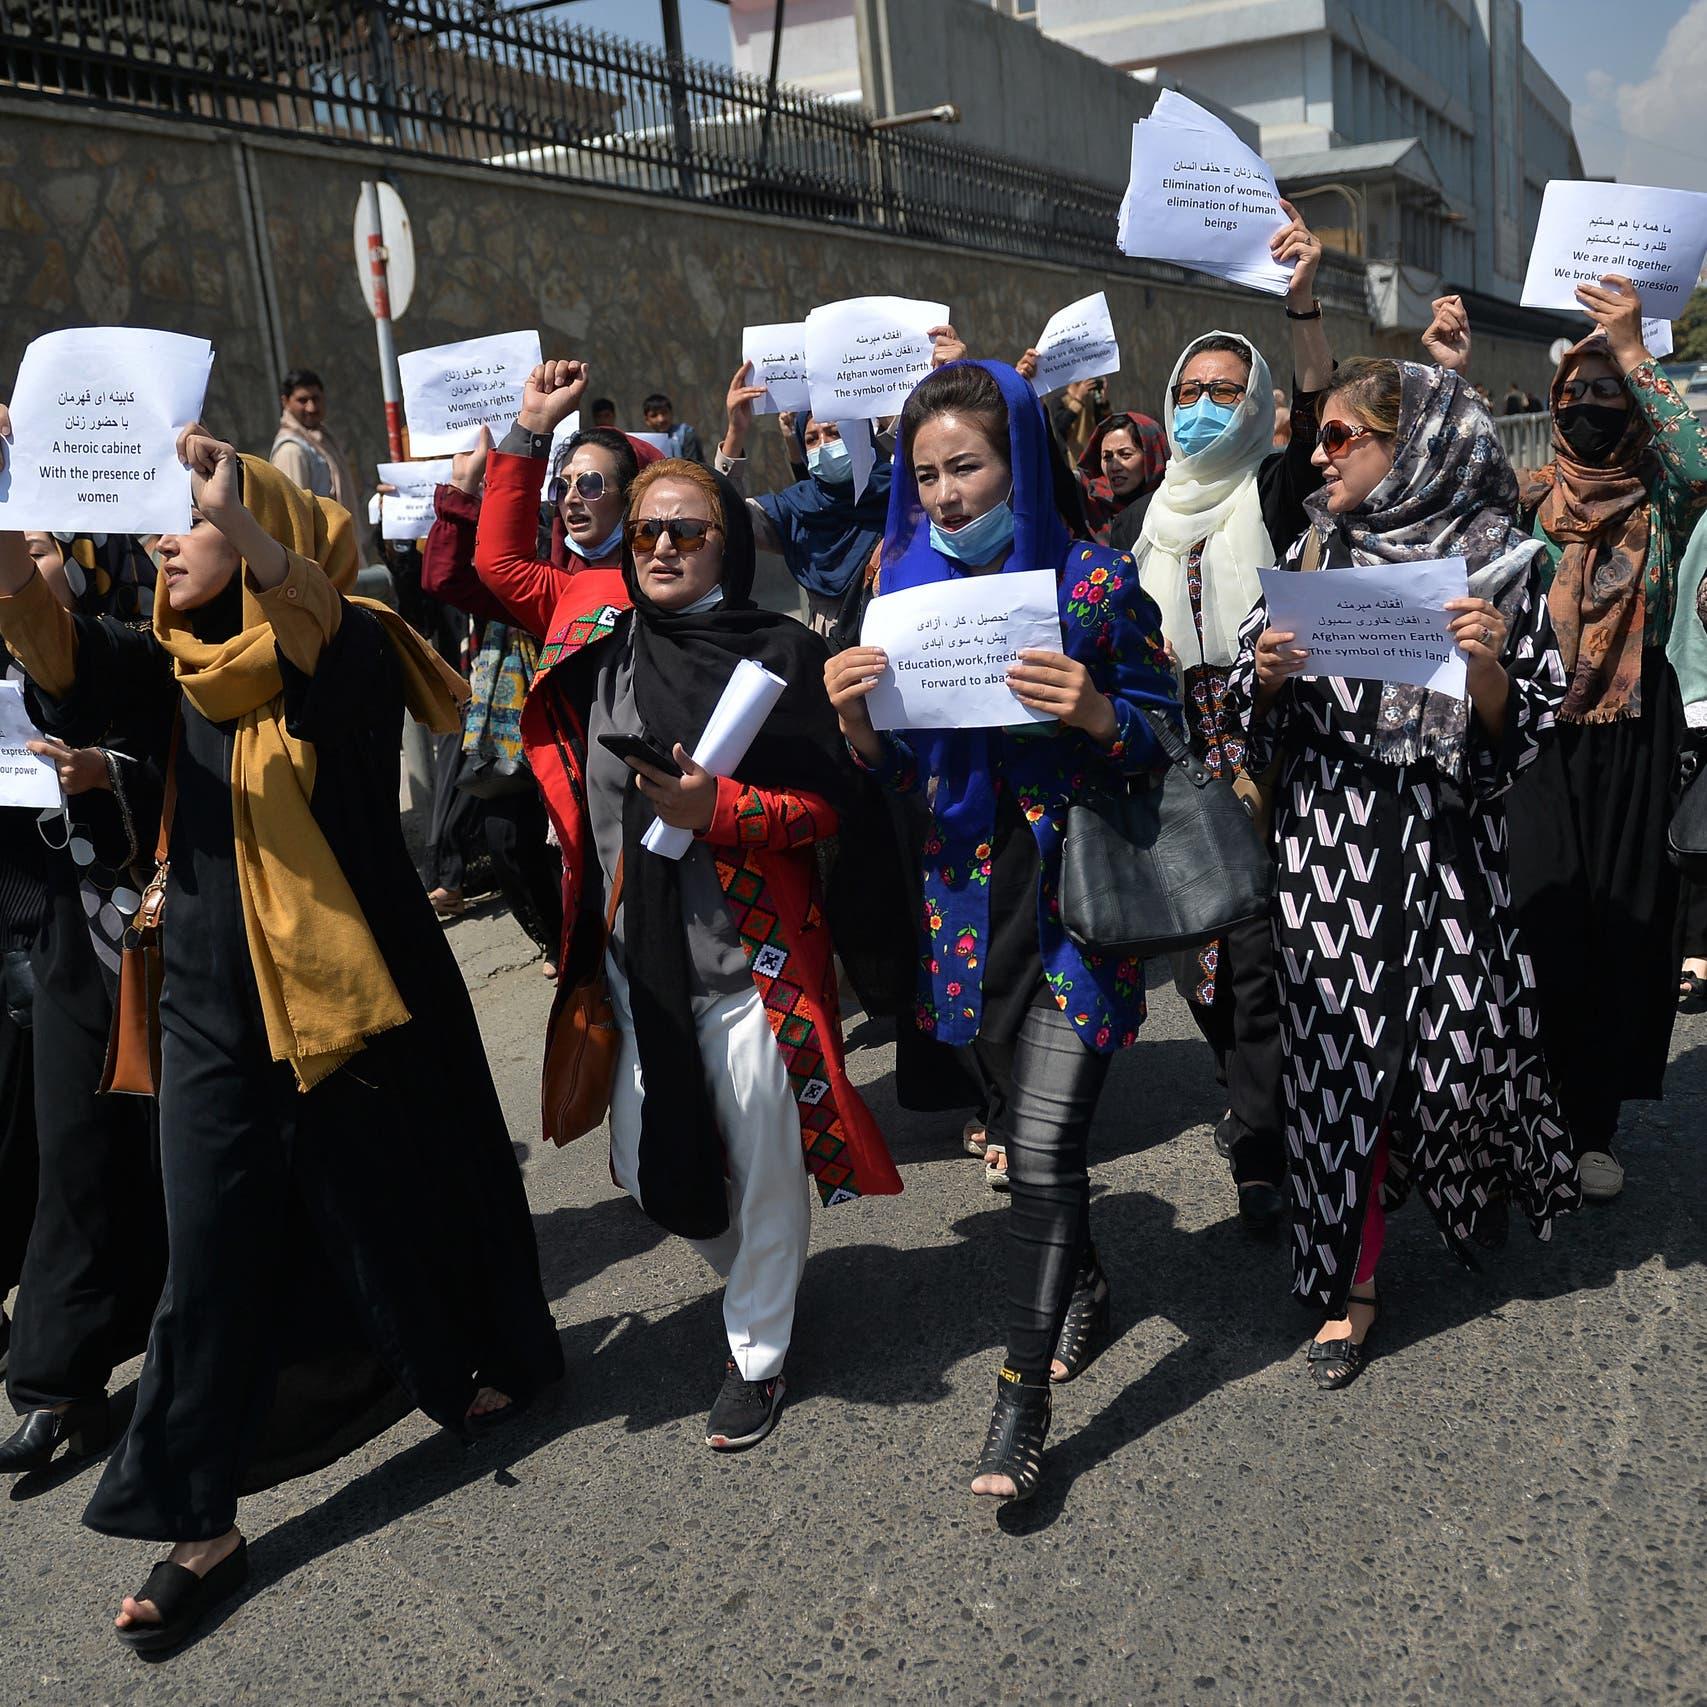 Senior Taliban member says women should not work alongside men